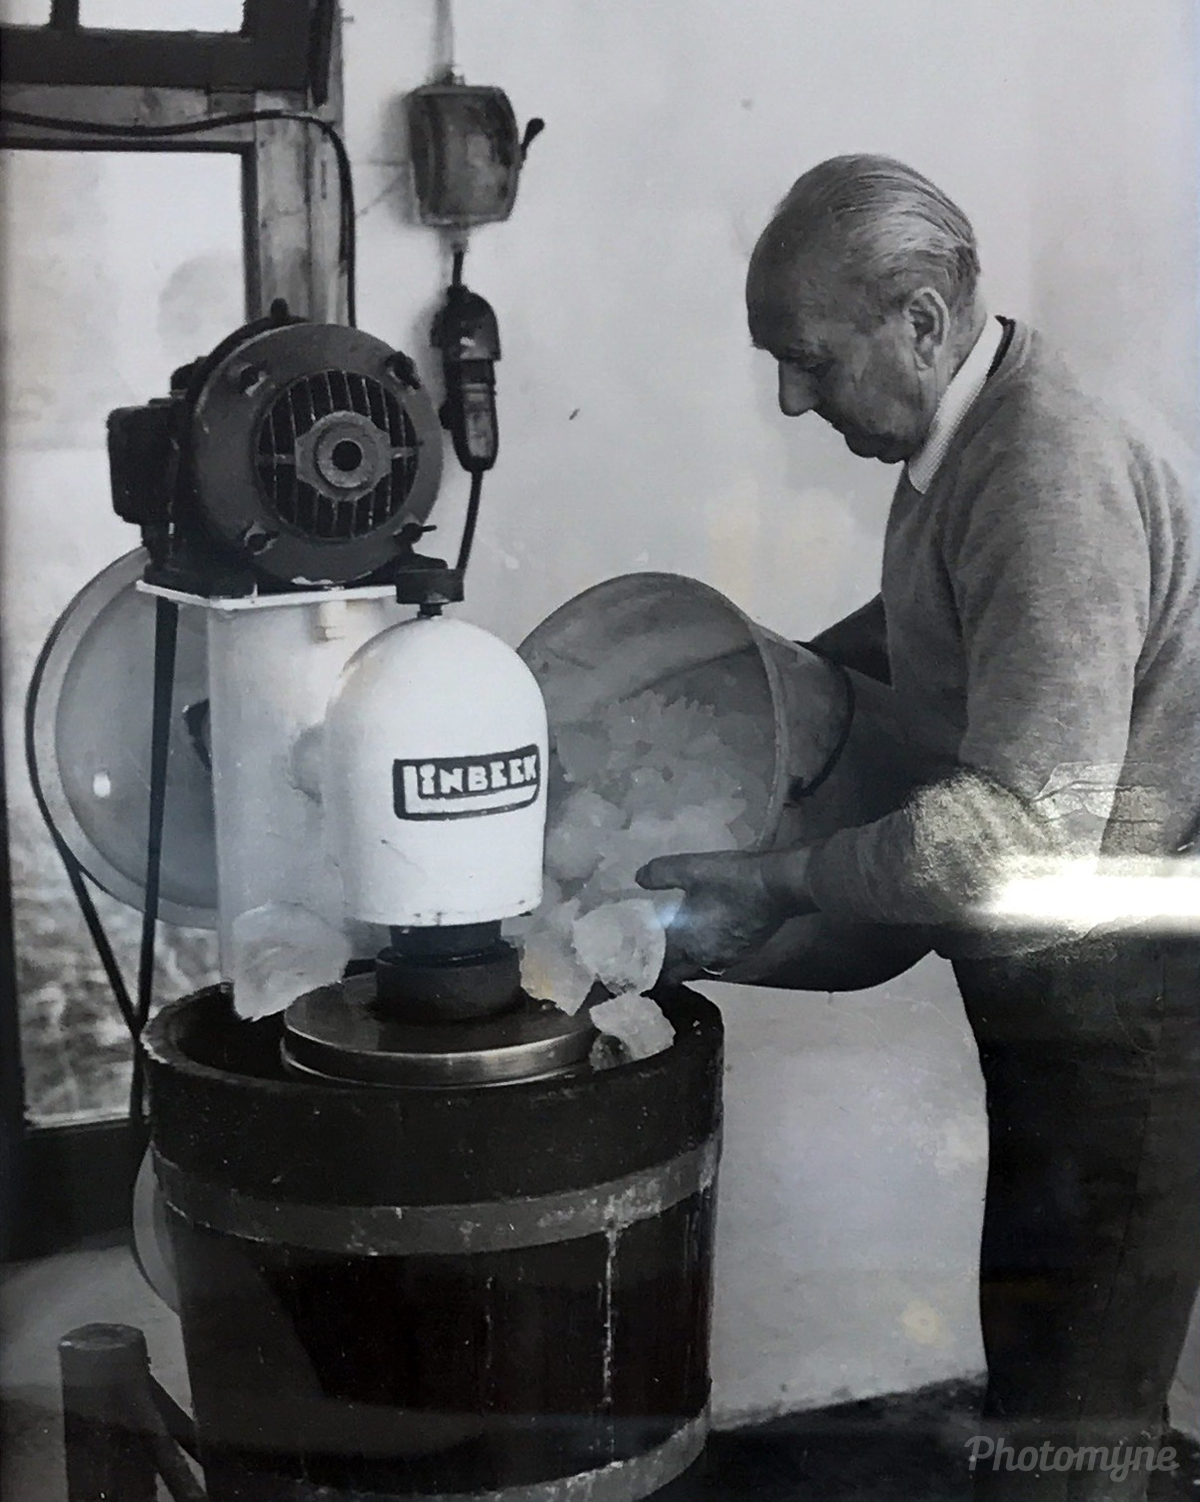 Mr. Willem Honingh preparing ice cream (secret recipe). Netherlands 1960